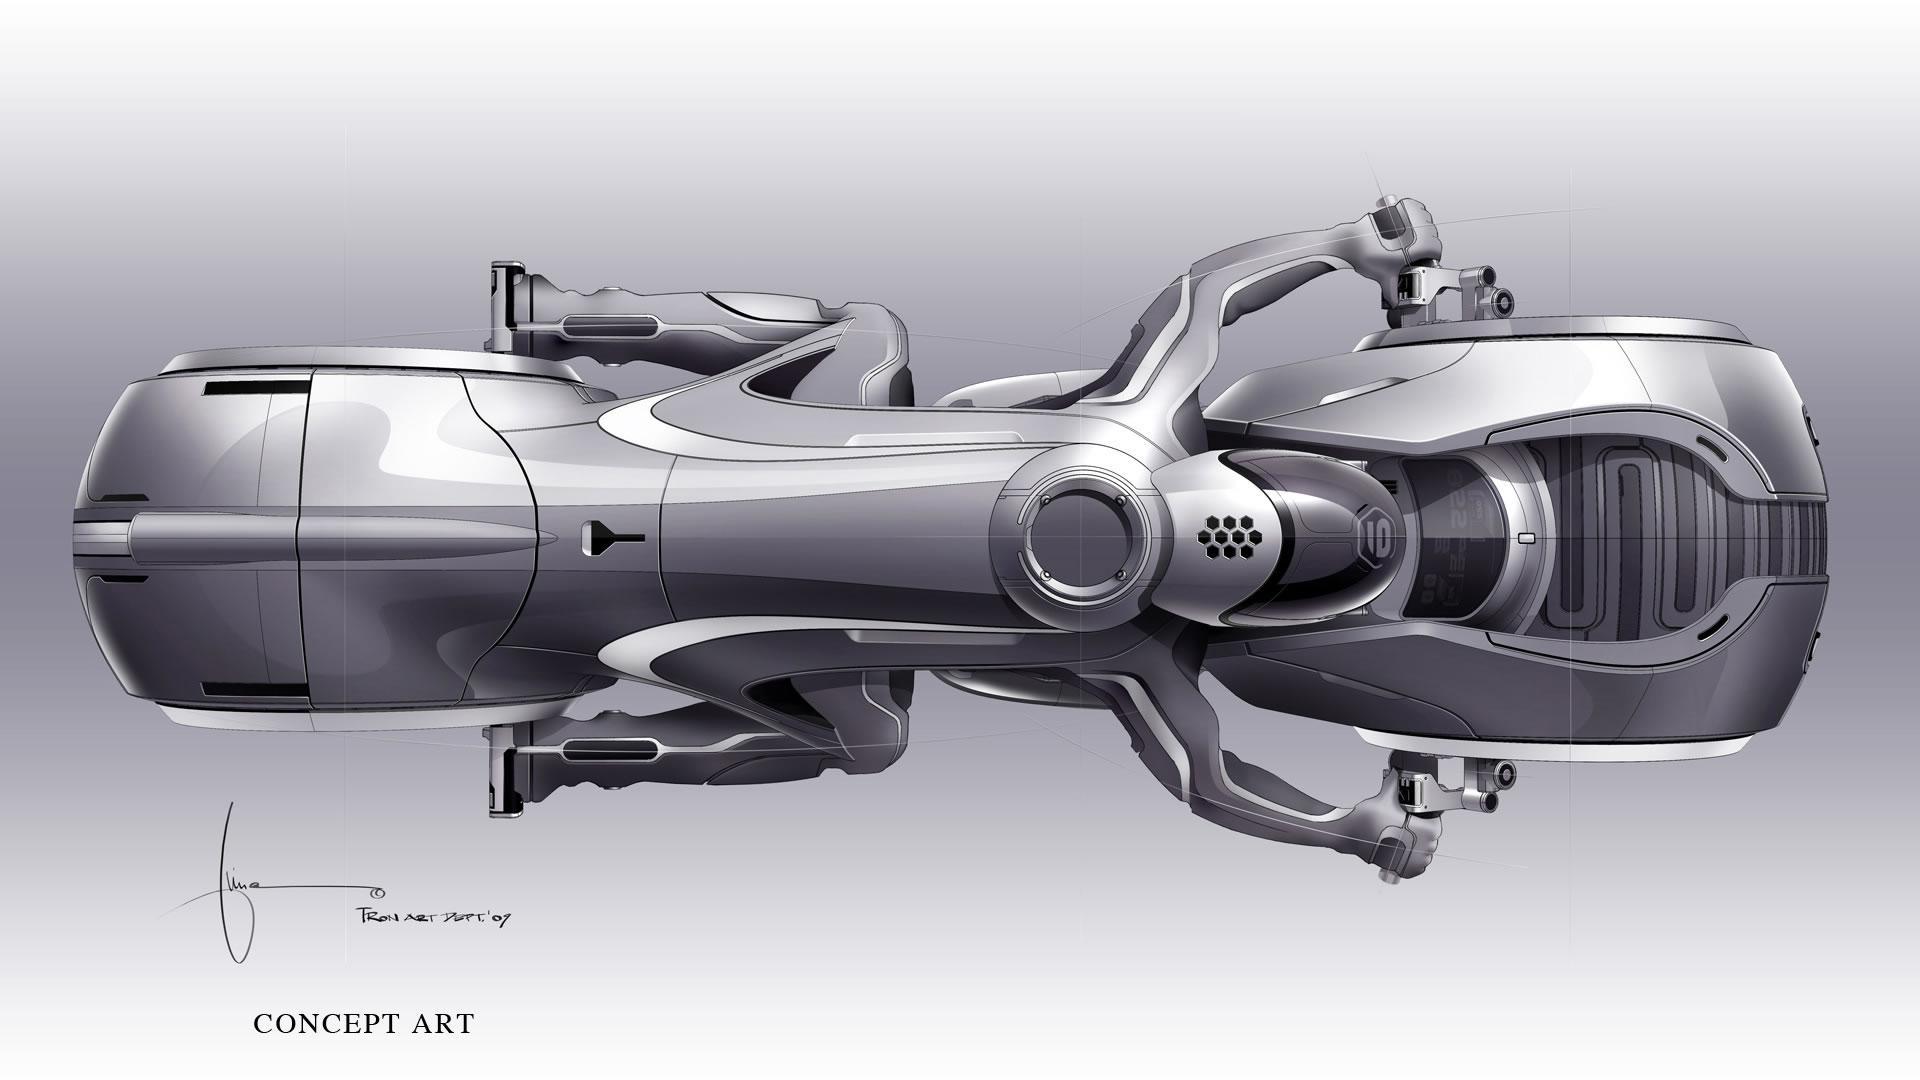 concept-artwork-Tron-Legacy-7.jpg (1920×1080)